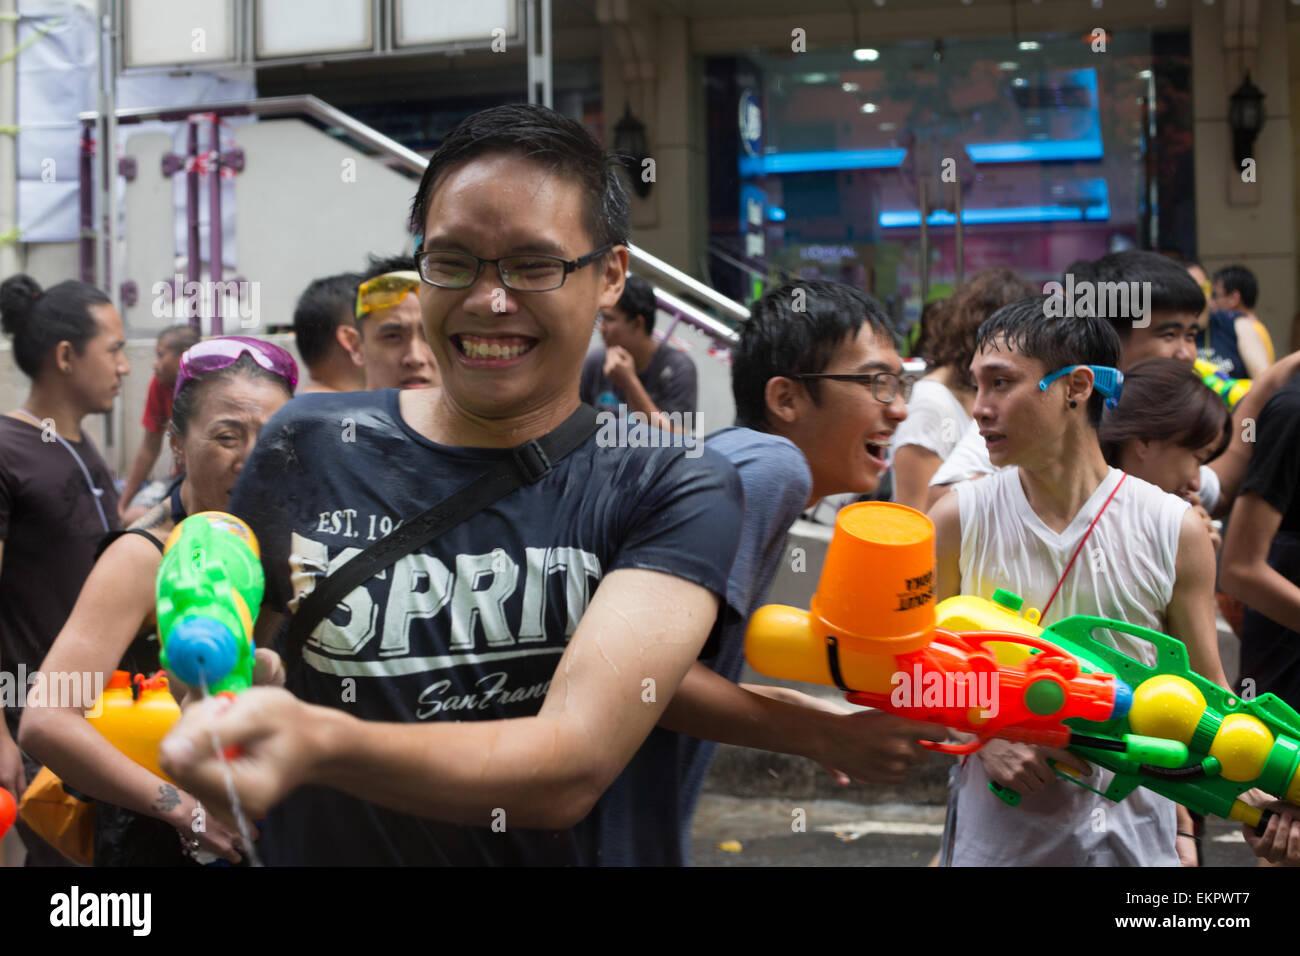 Bangkok, Thailand. 13th April, 2015. Revelers take part in the annual Songkran festival on Silom Road, Bangkok on - Stock Image